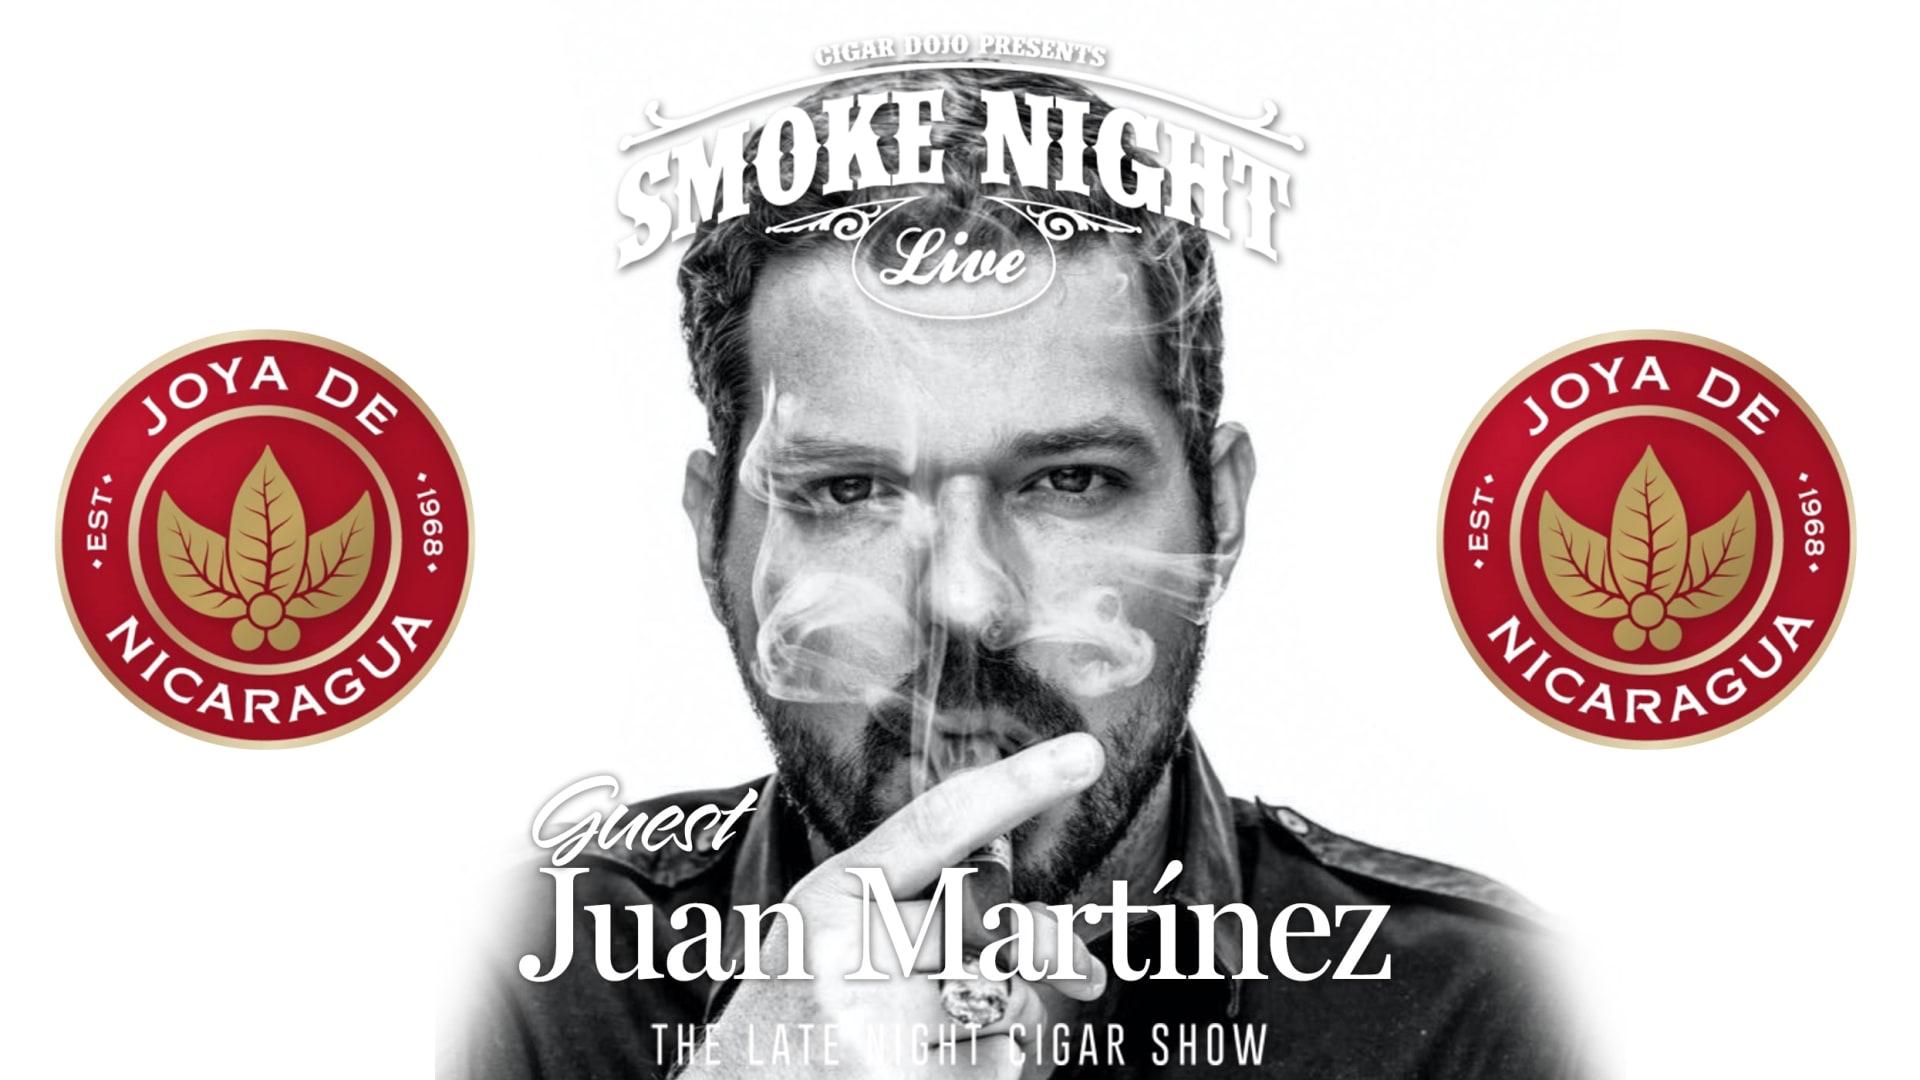 Smoke Night LIVE with Joya de Nicaragua's Juan Martínez Featured Image